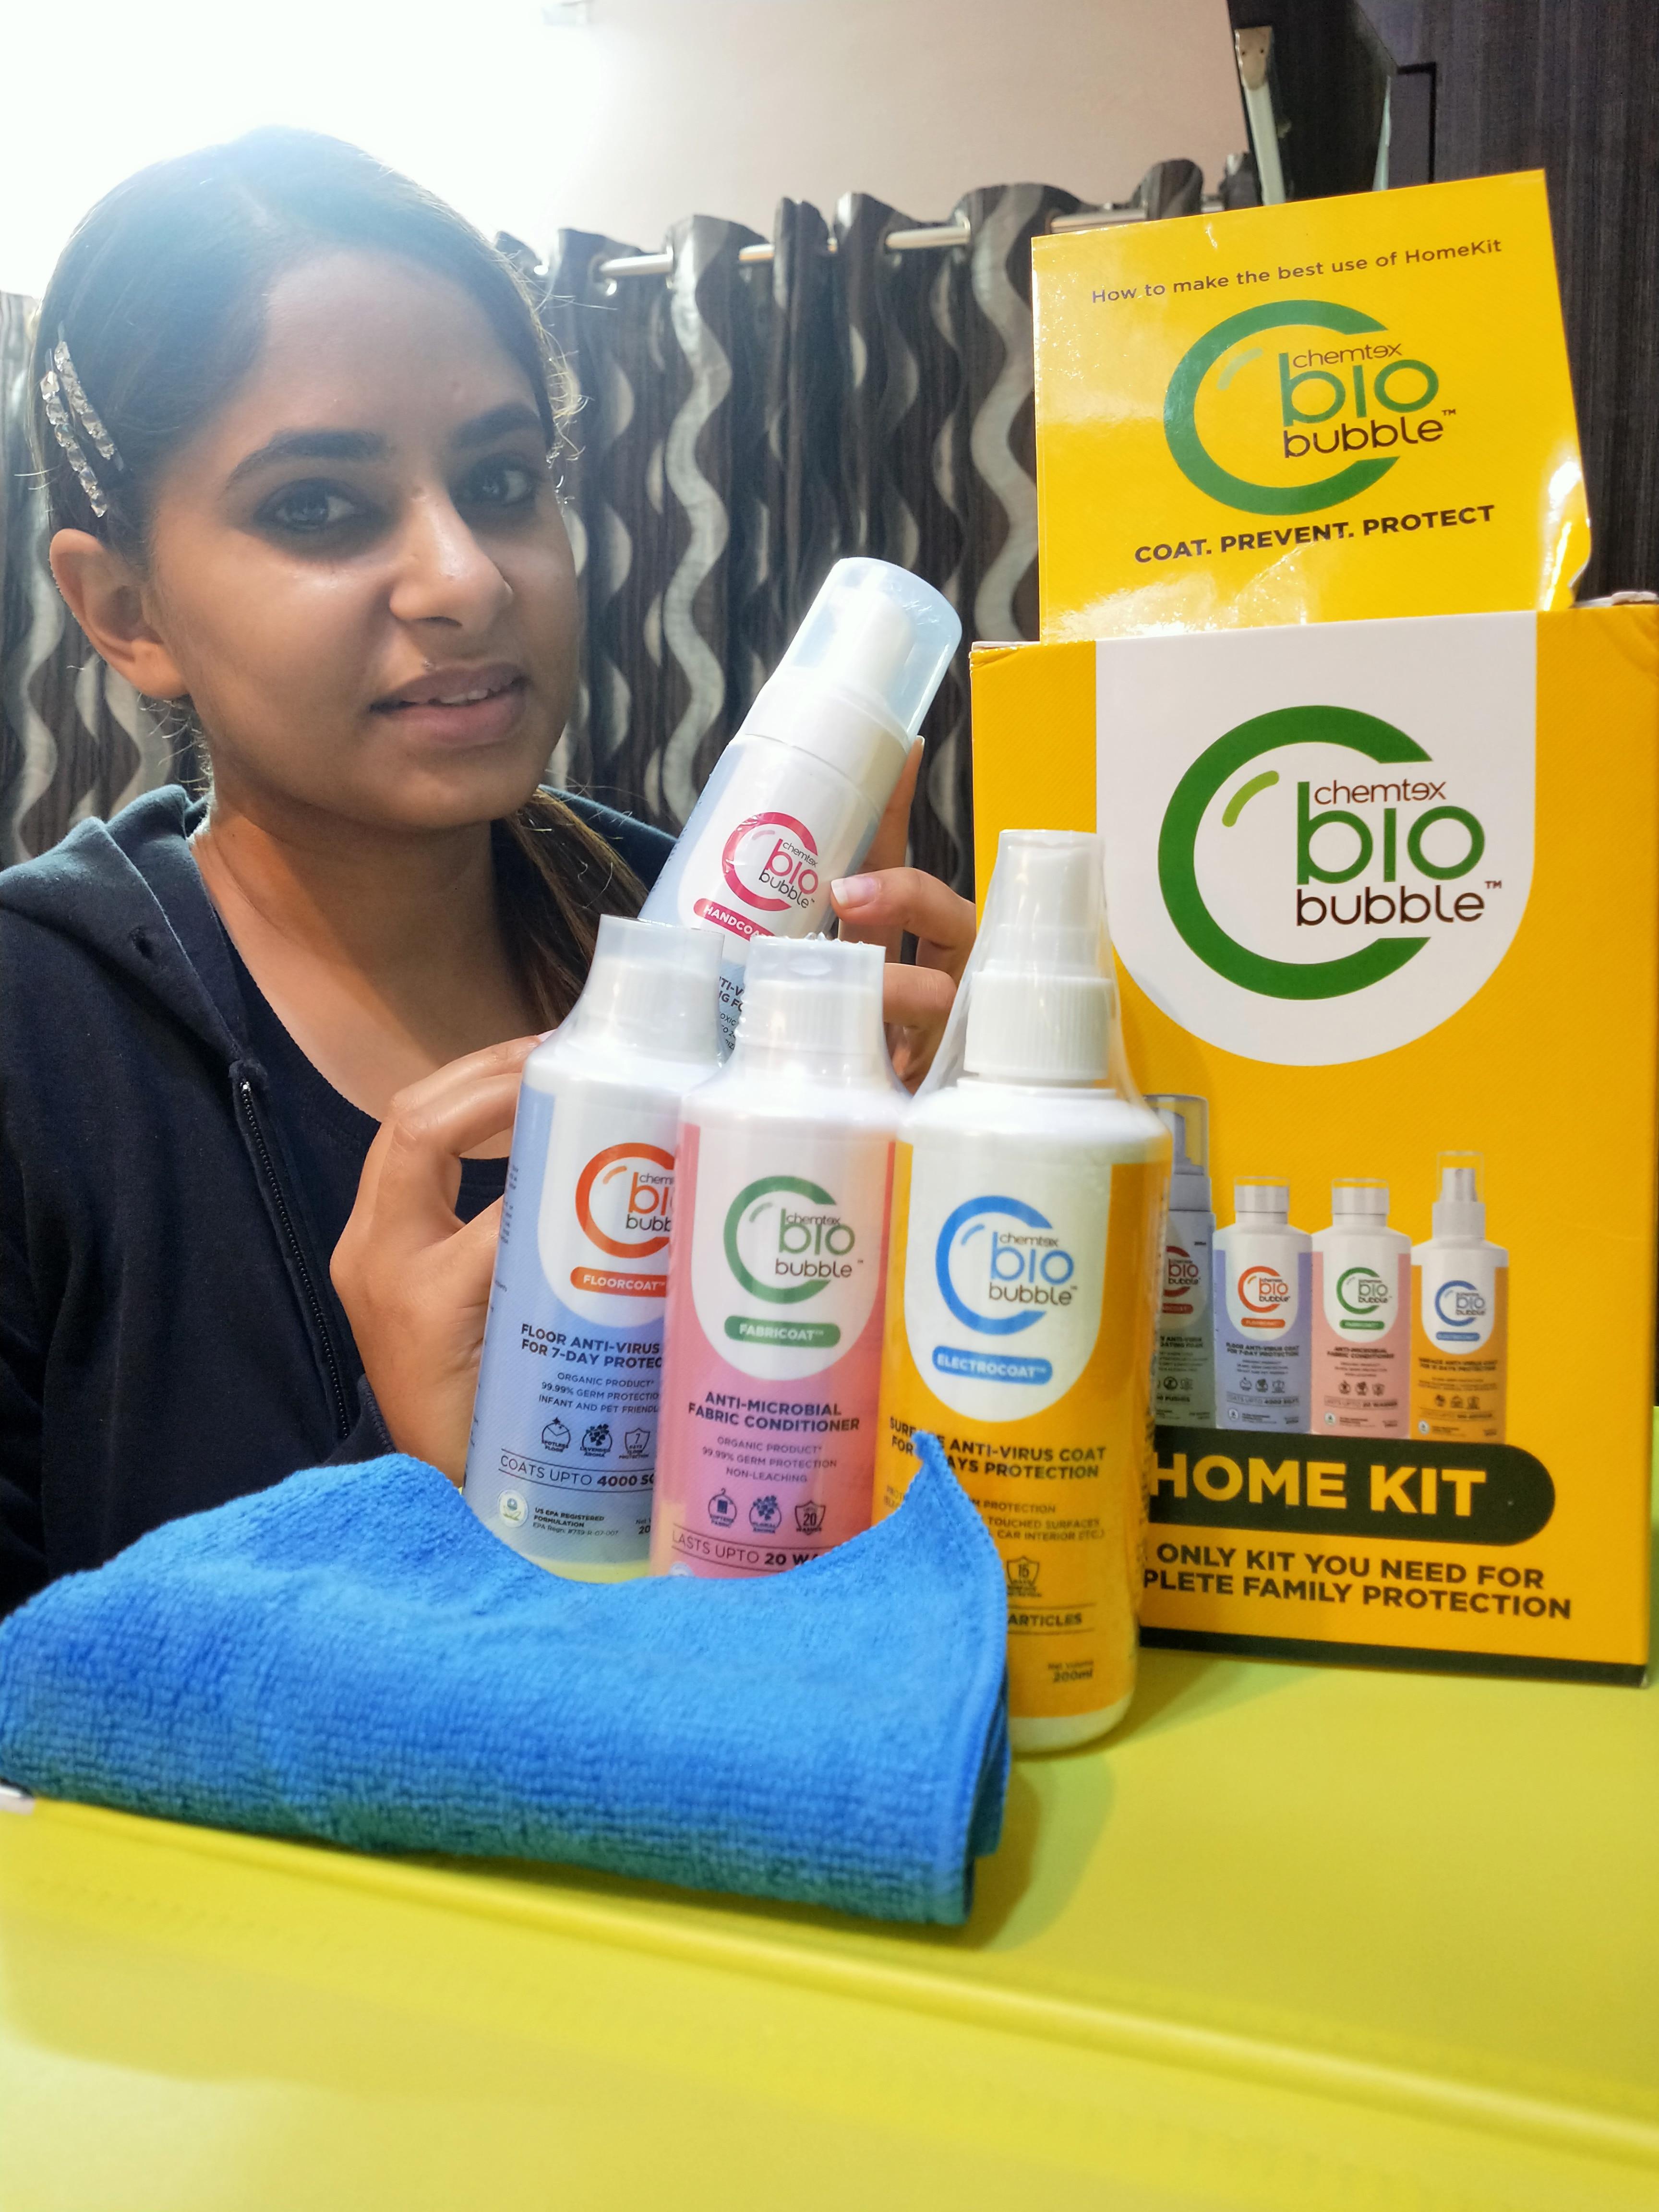 Chemtex Biobubble Home Kit-Saviour for family-By dilpreet_bhatia